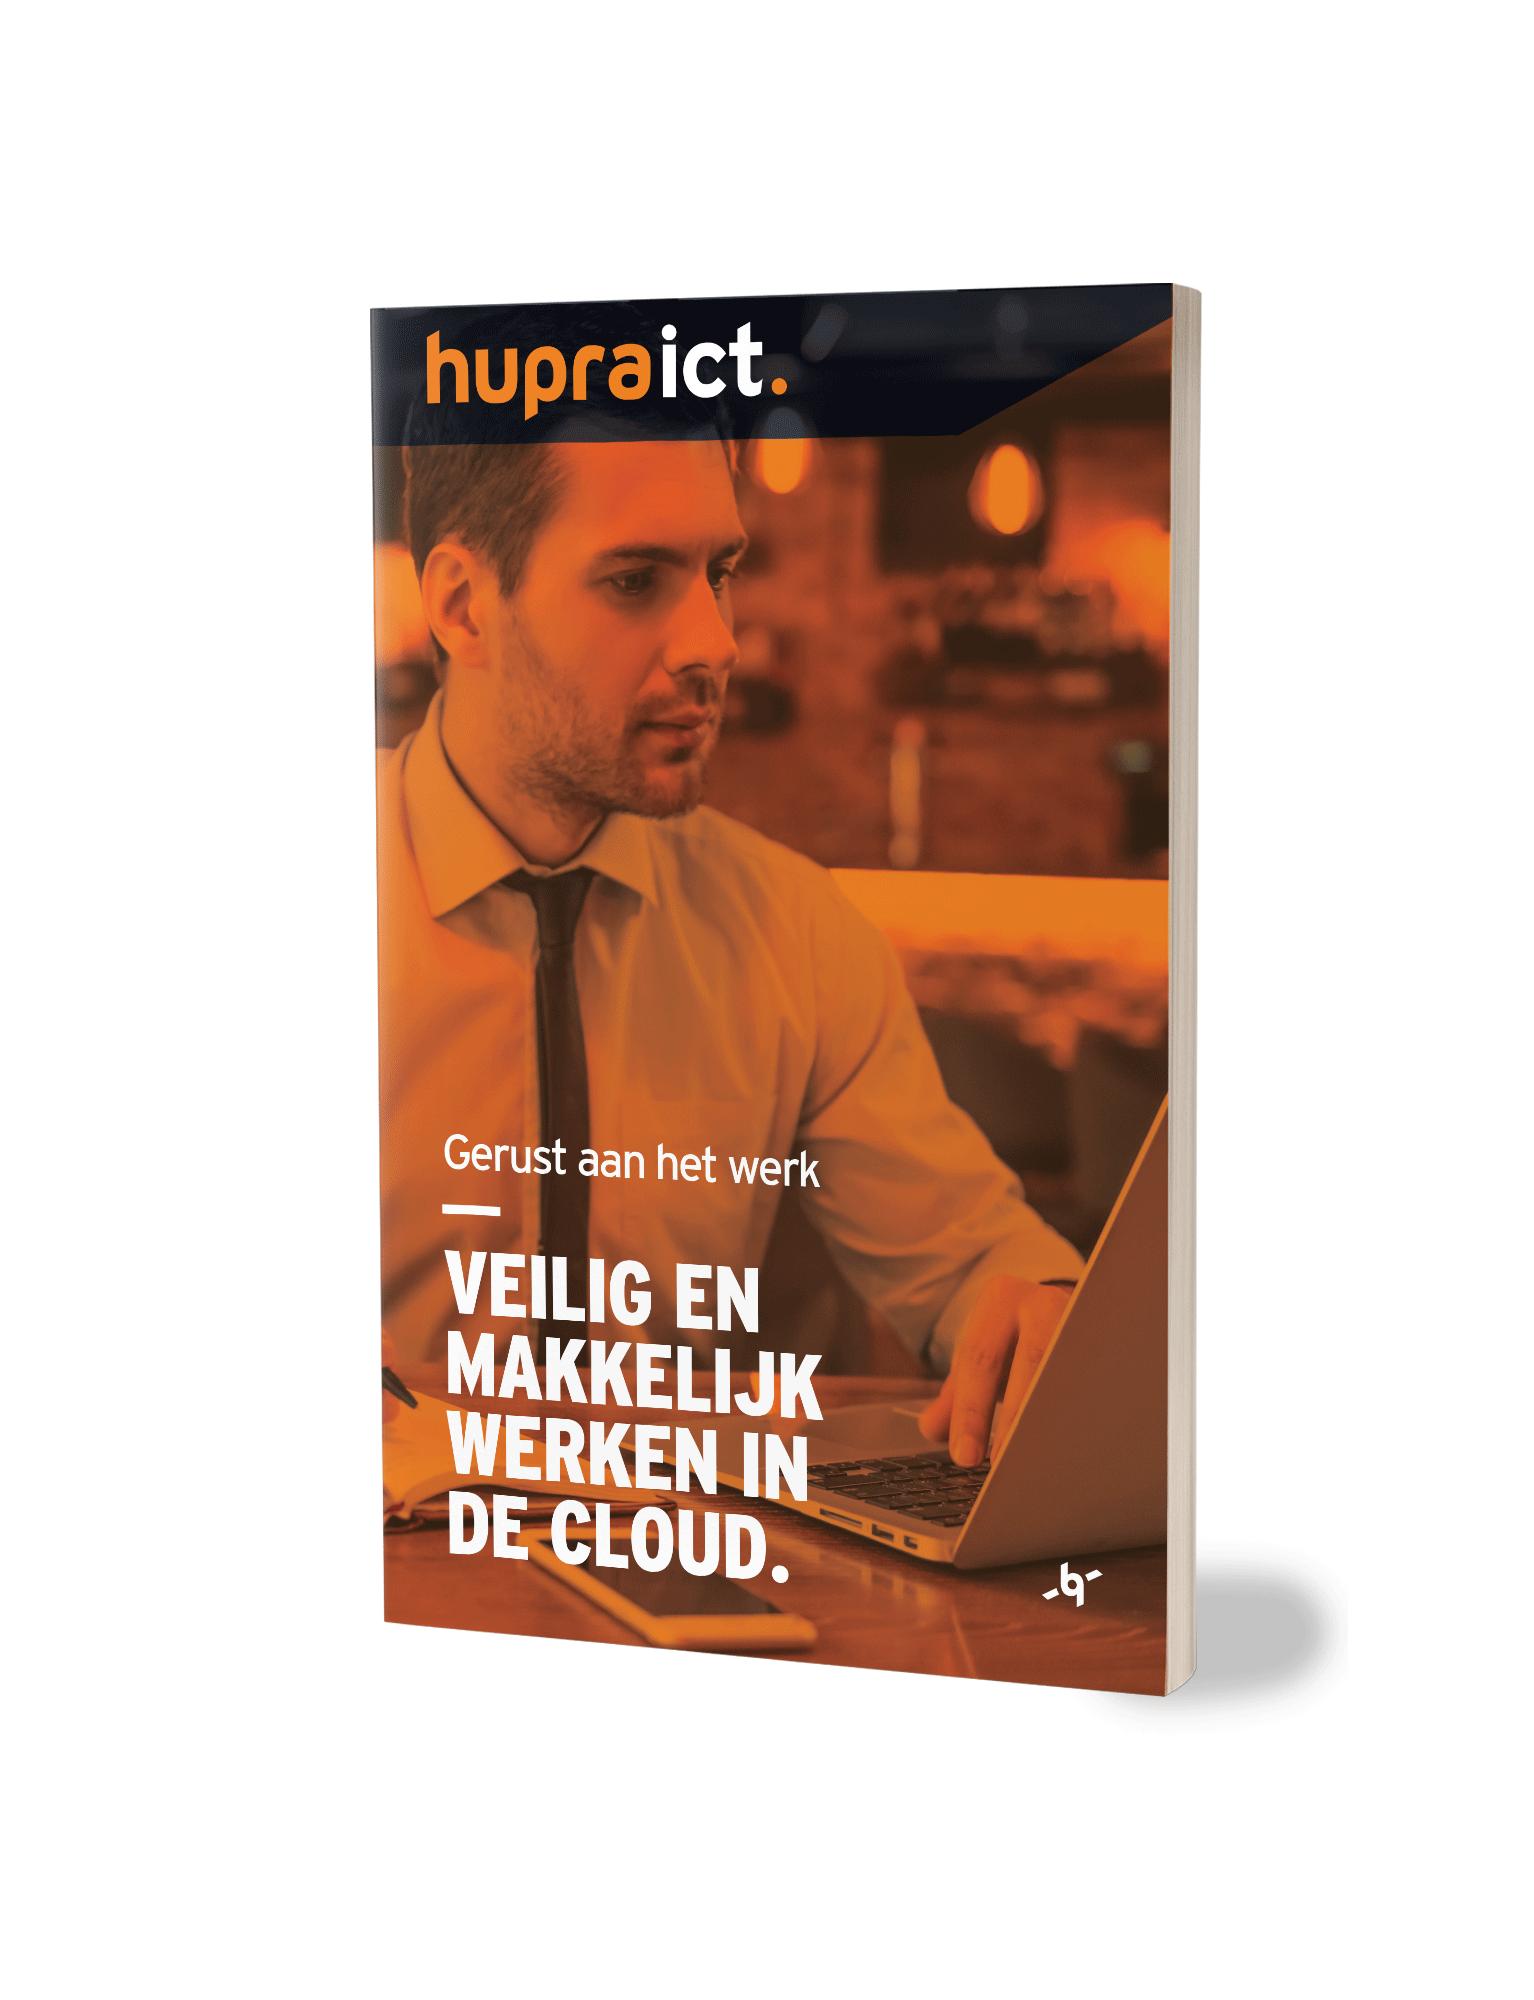 veiligmakkelijkwerkcloud_ebook